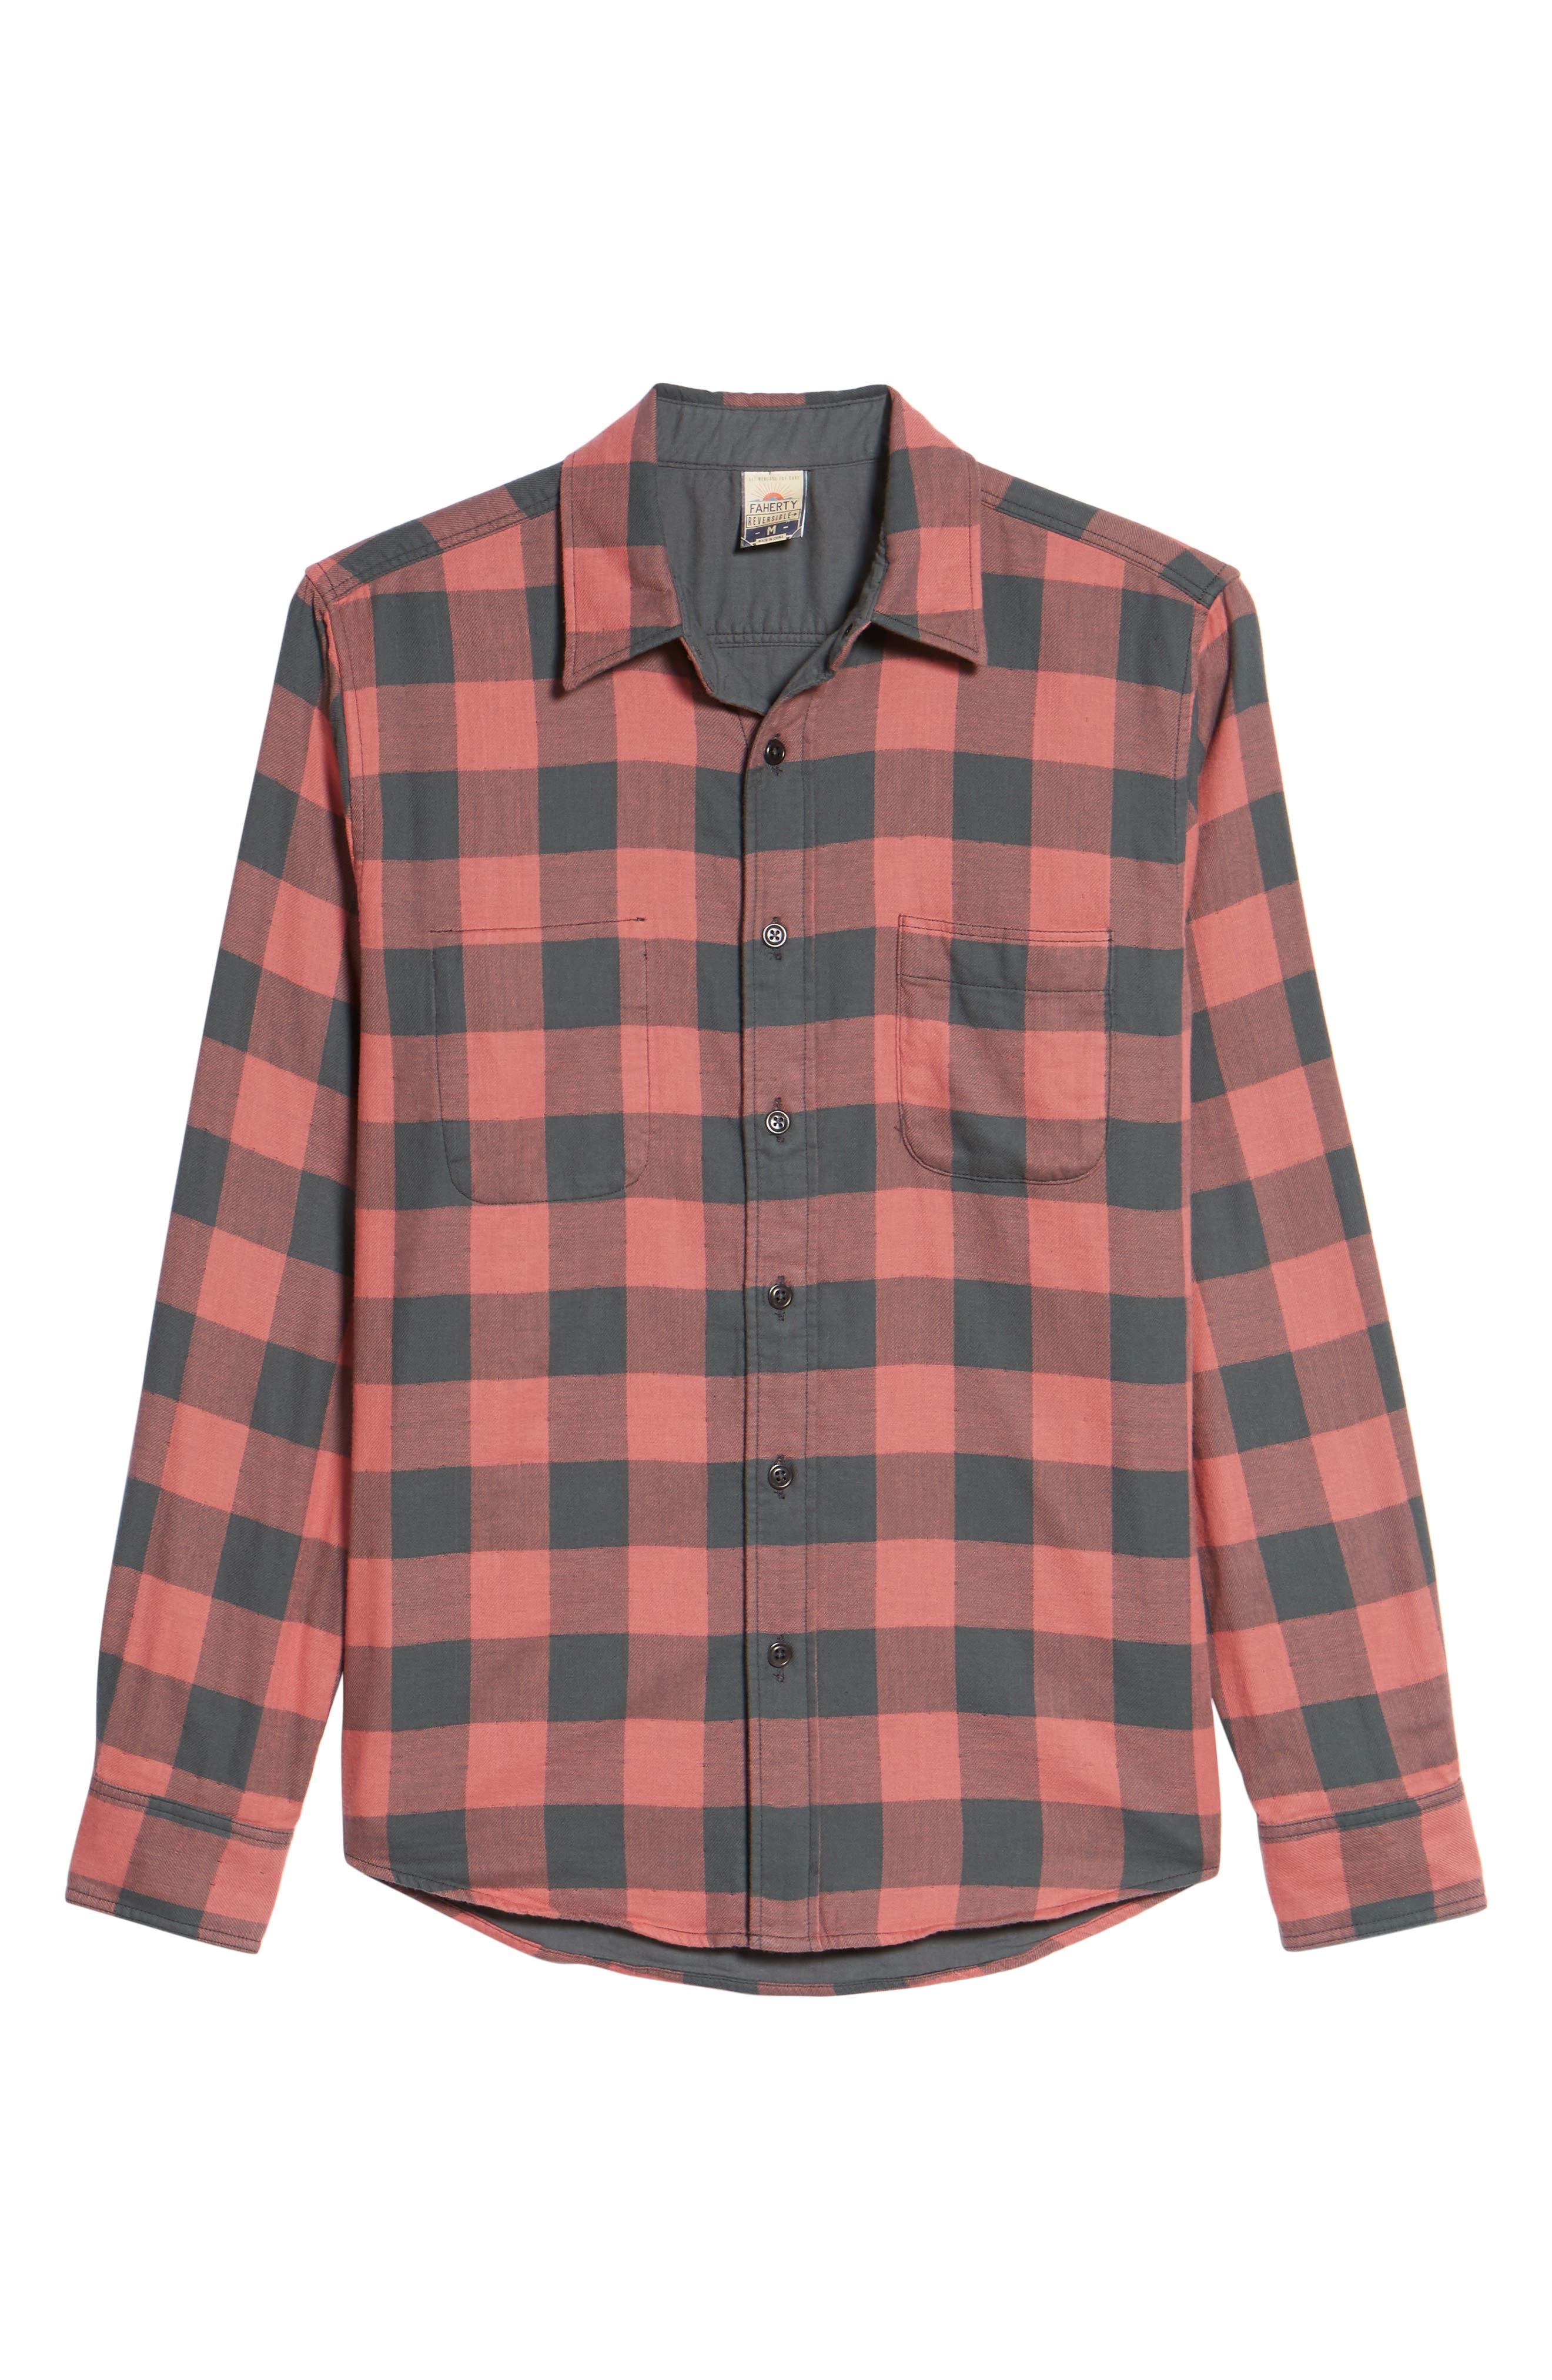 Belmar Trim Fit Long Sleeve Reversible Sport Shirt,                             Alternate thumbnail 6, color,                             Grey / Red Buffalo Check